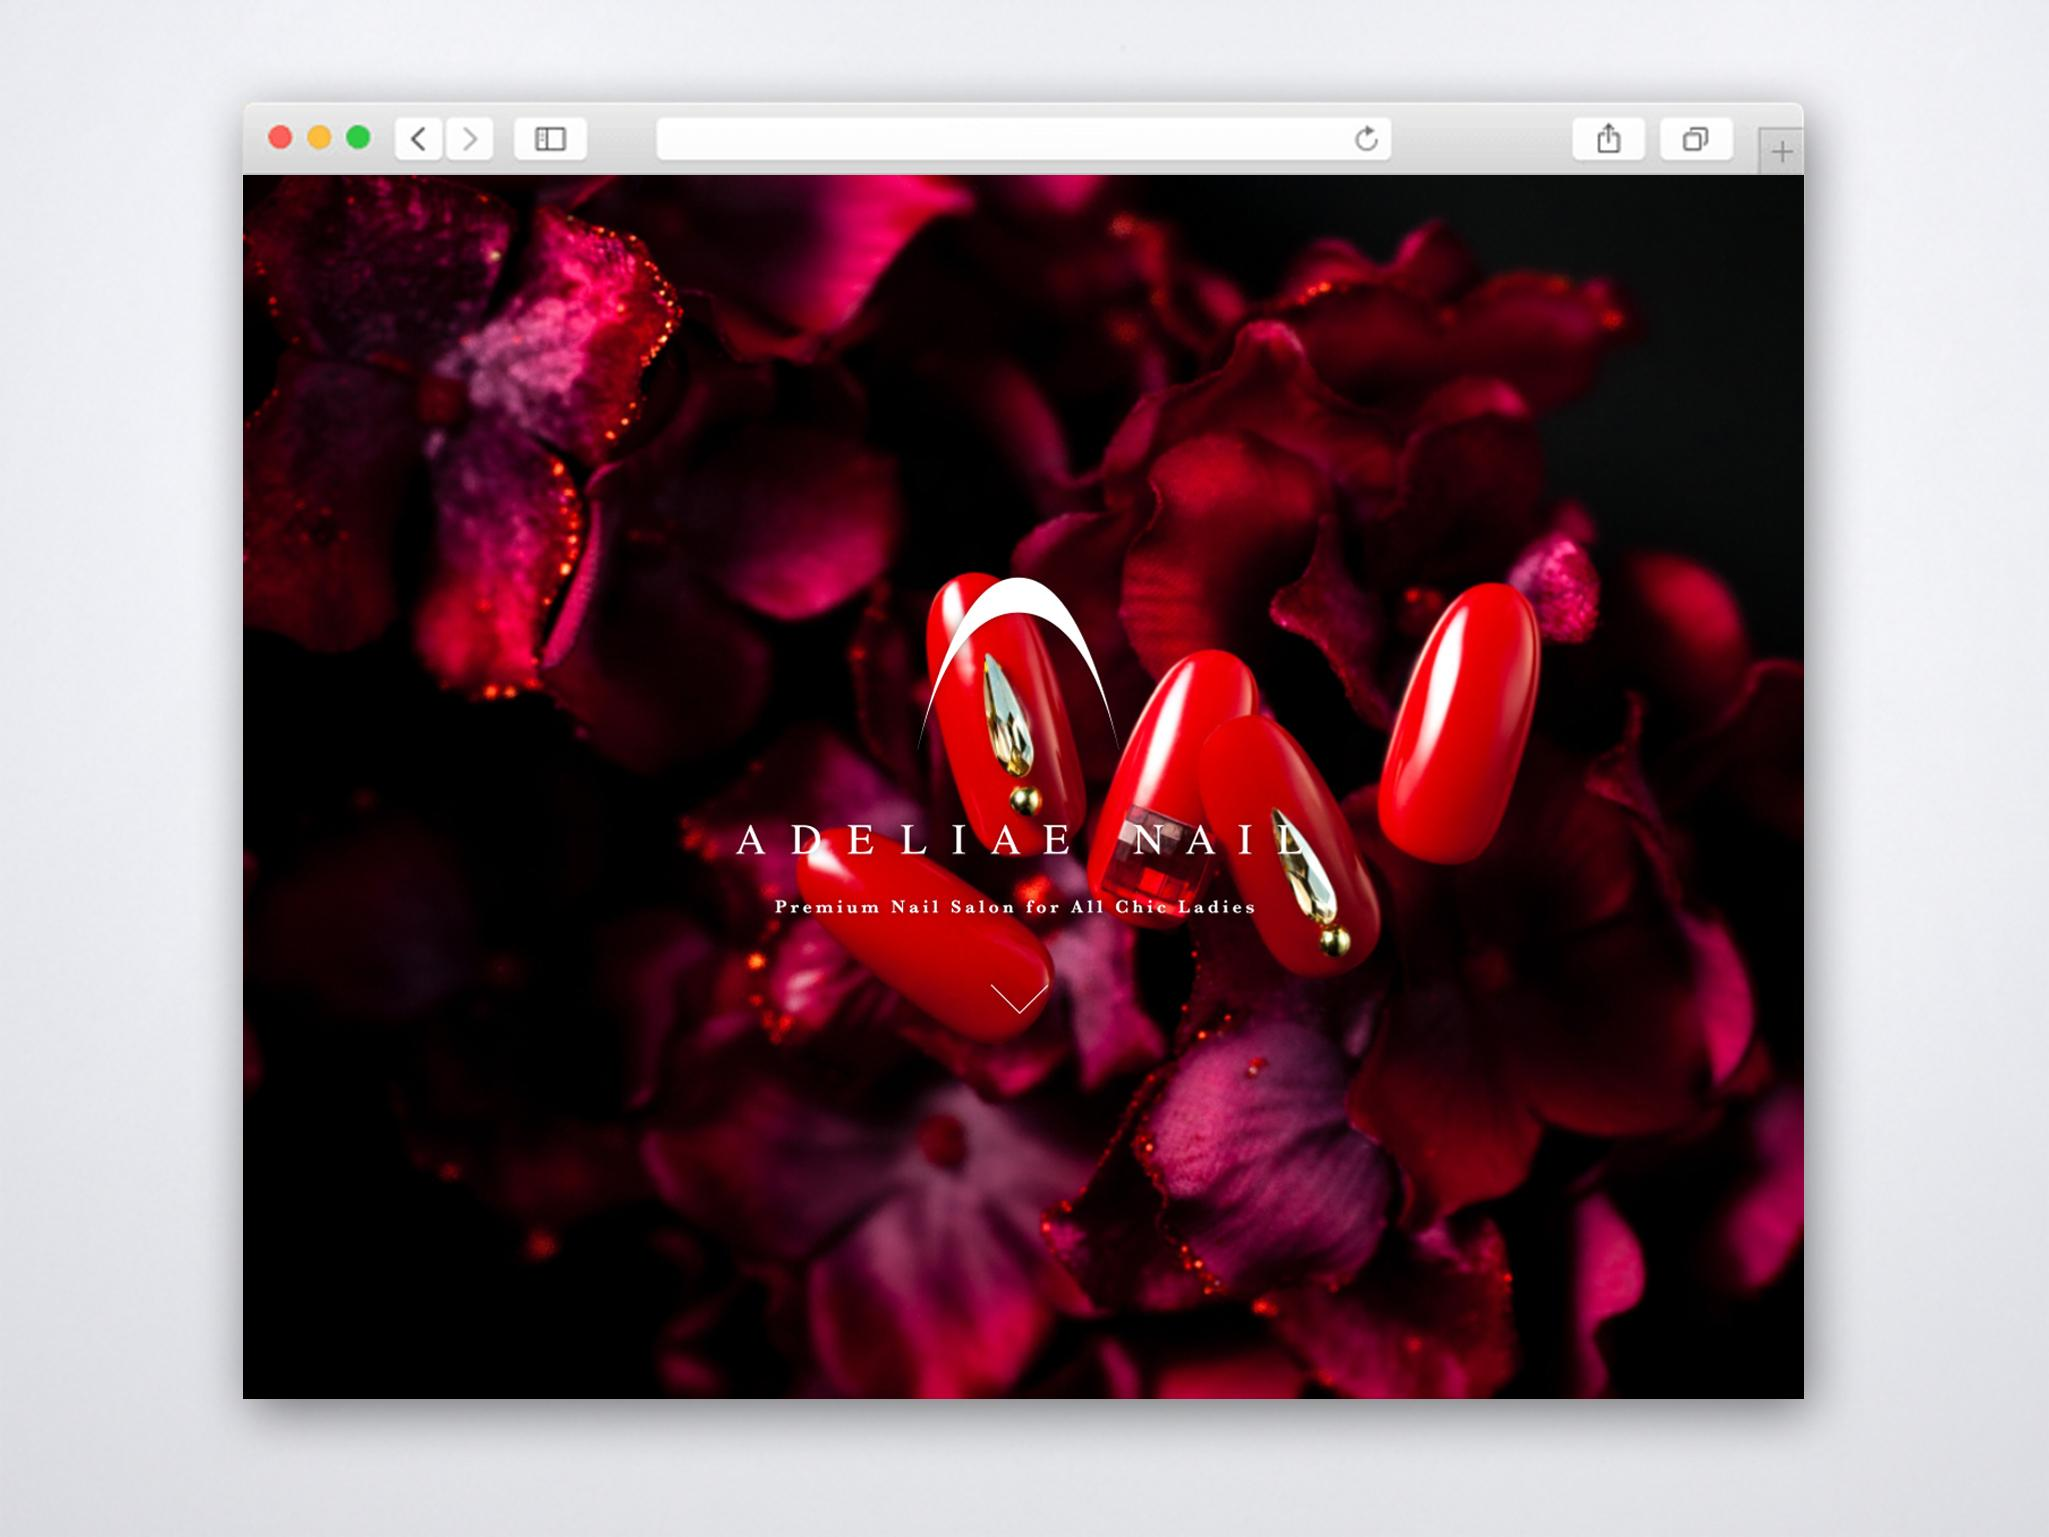 ADELIAE NAIL 名古屋 ブランディング デザイン ネイルサロン